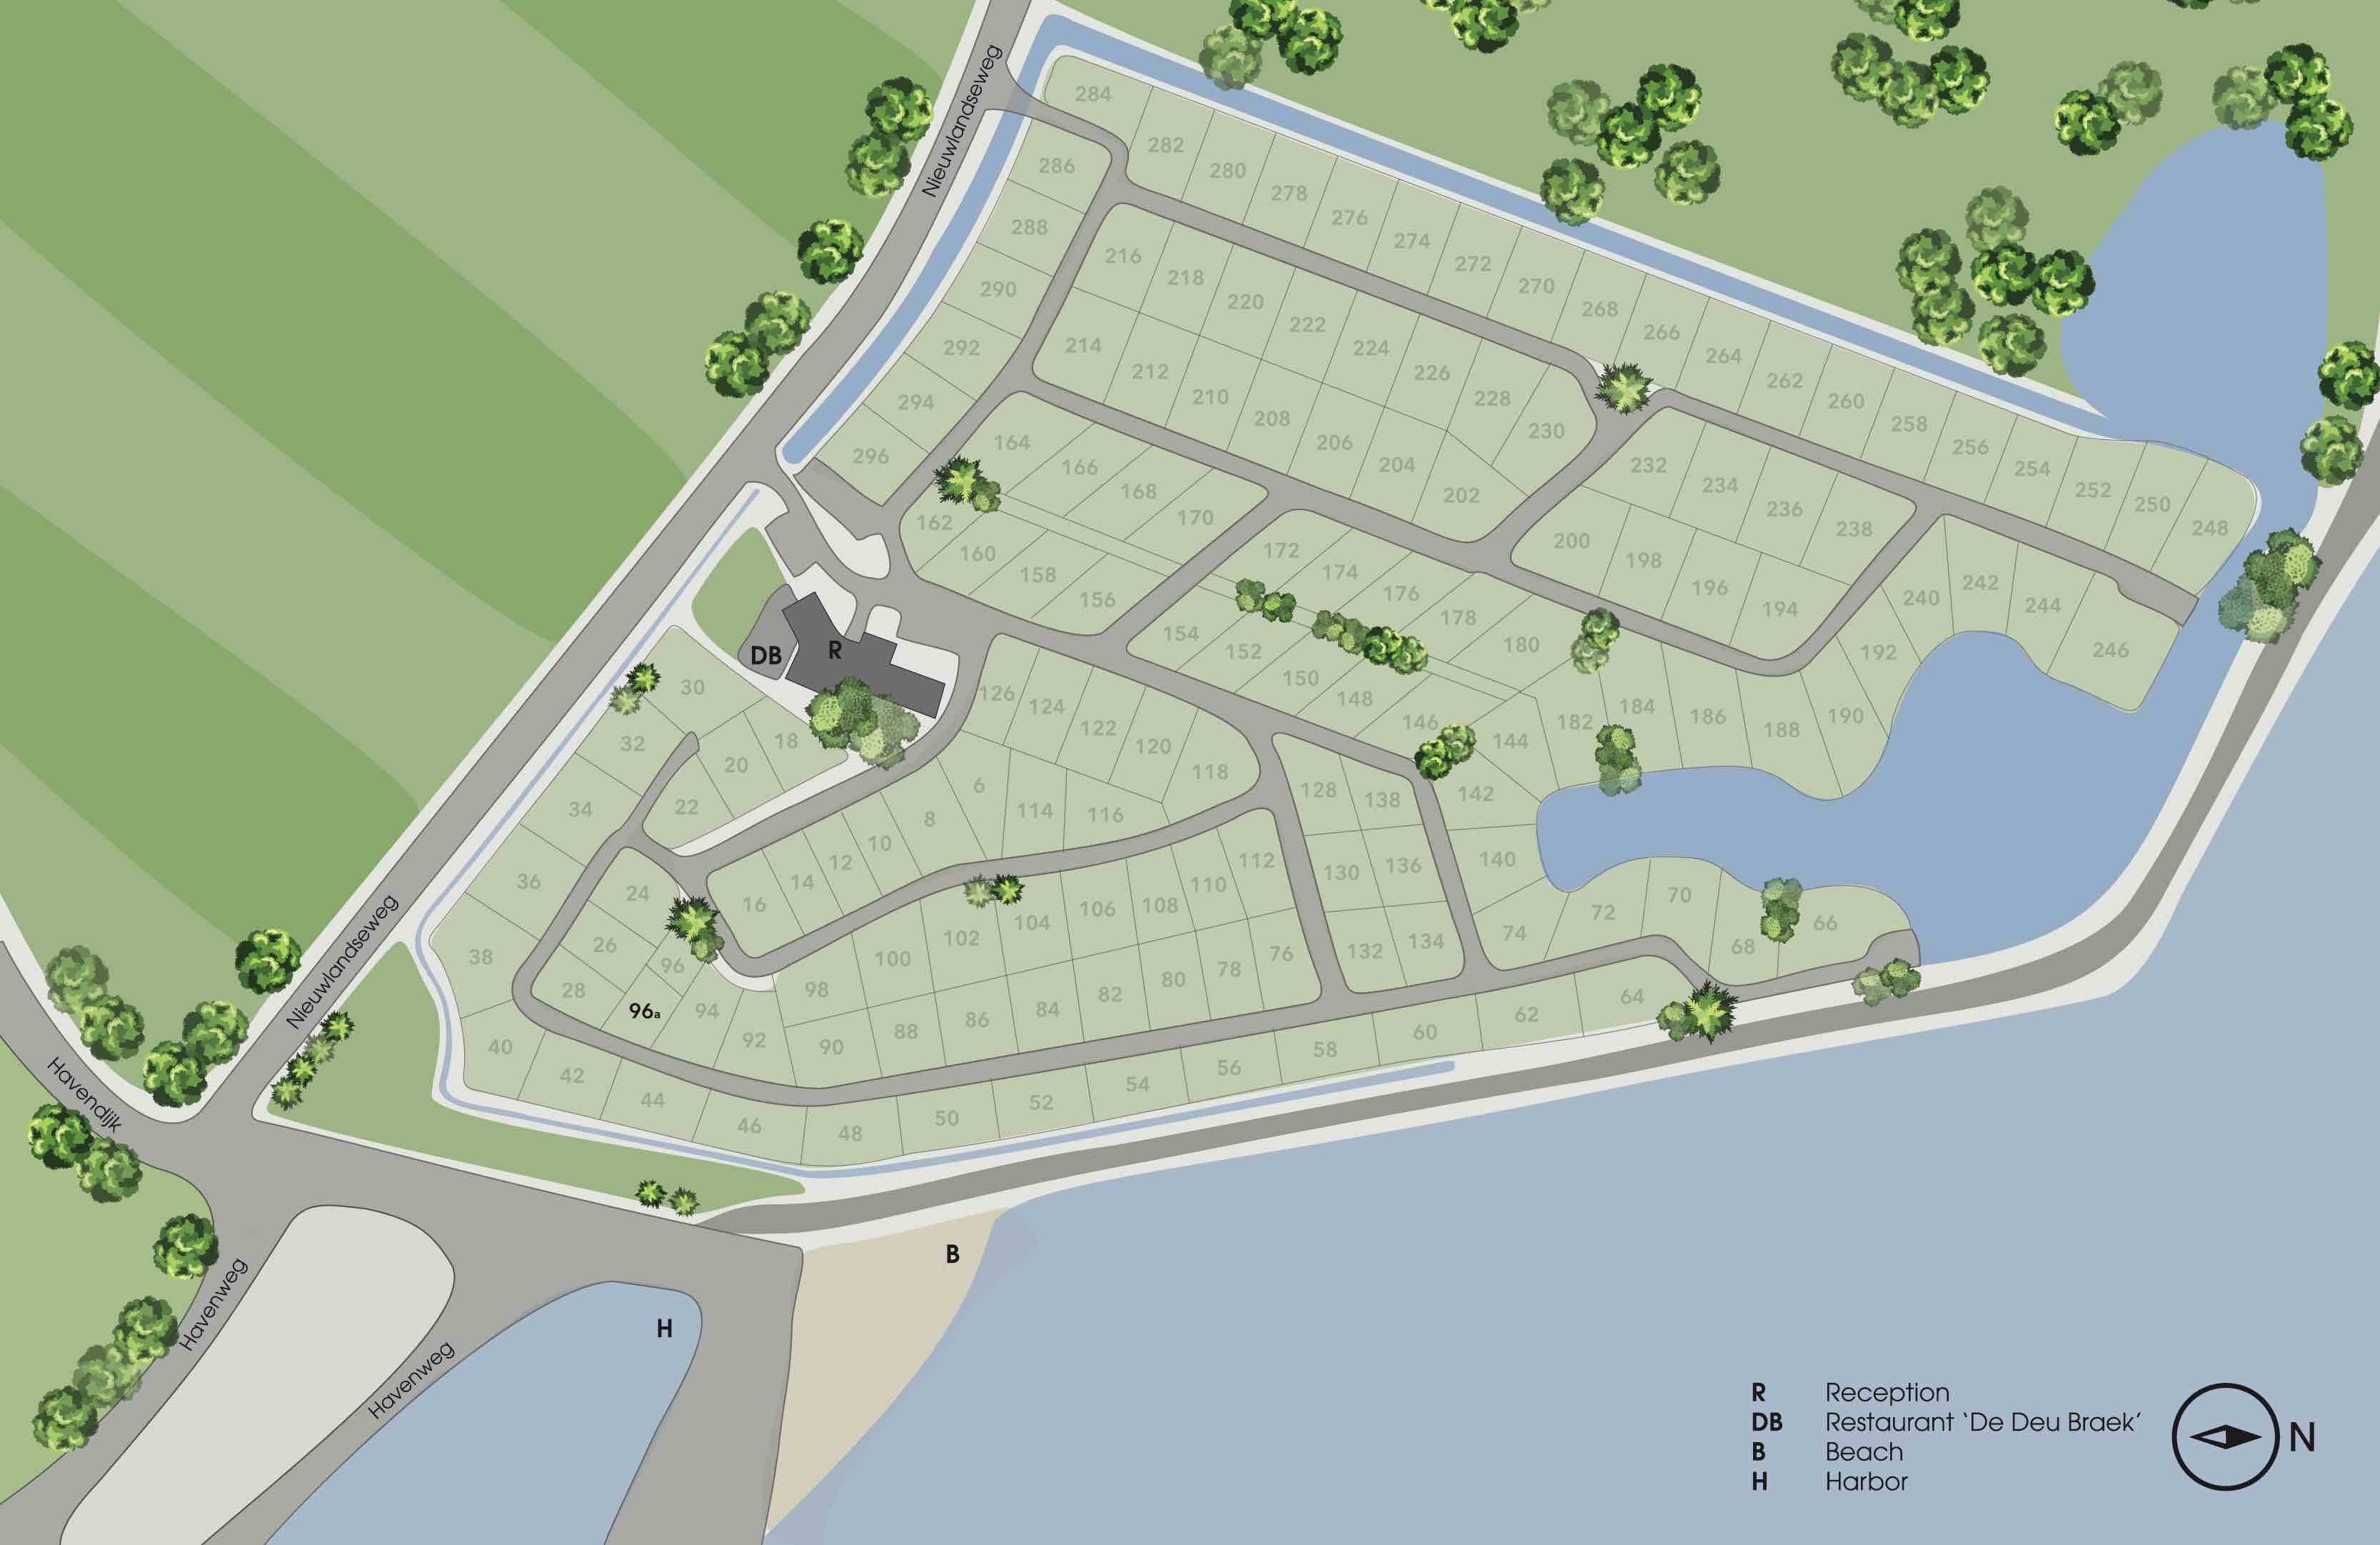 Zeeland Map - V2 - Huis 96a